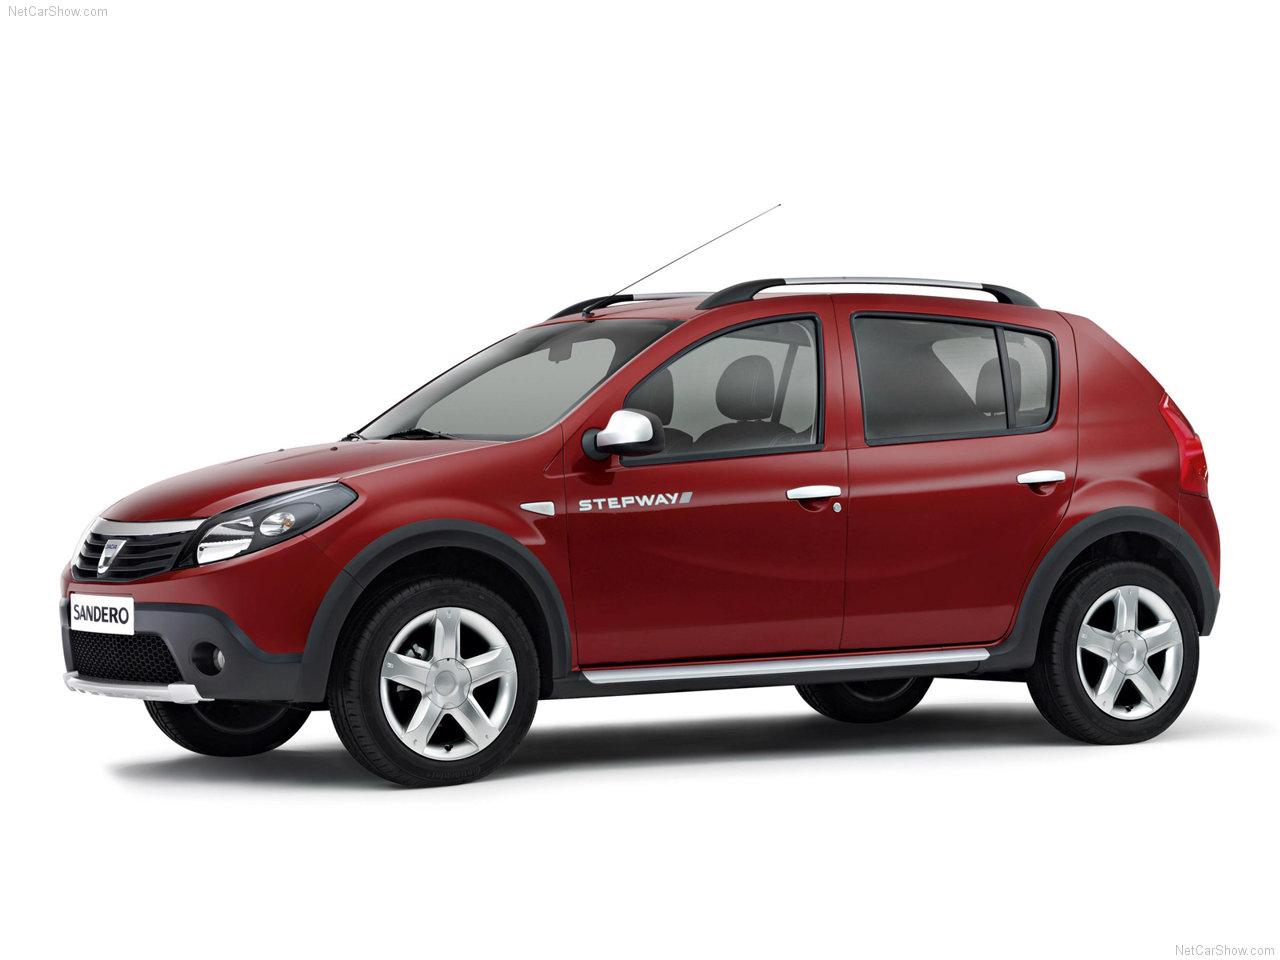 Dacia Sandero 12 High Resolution Wallpaper